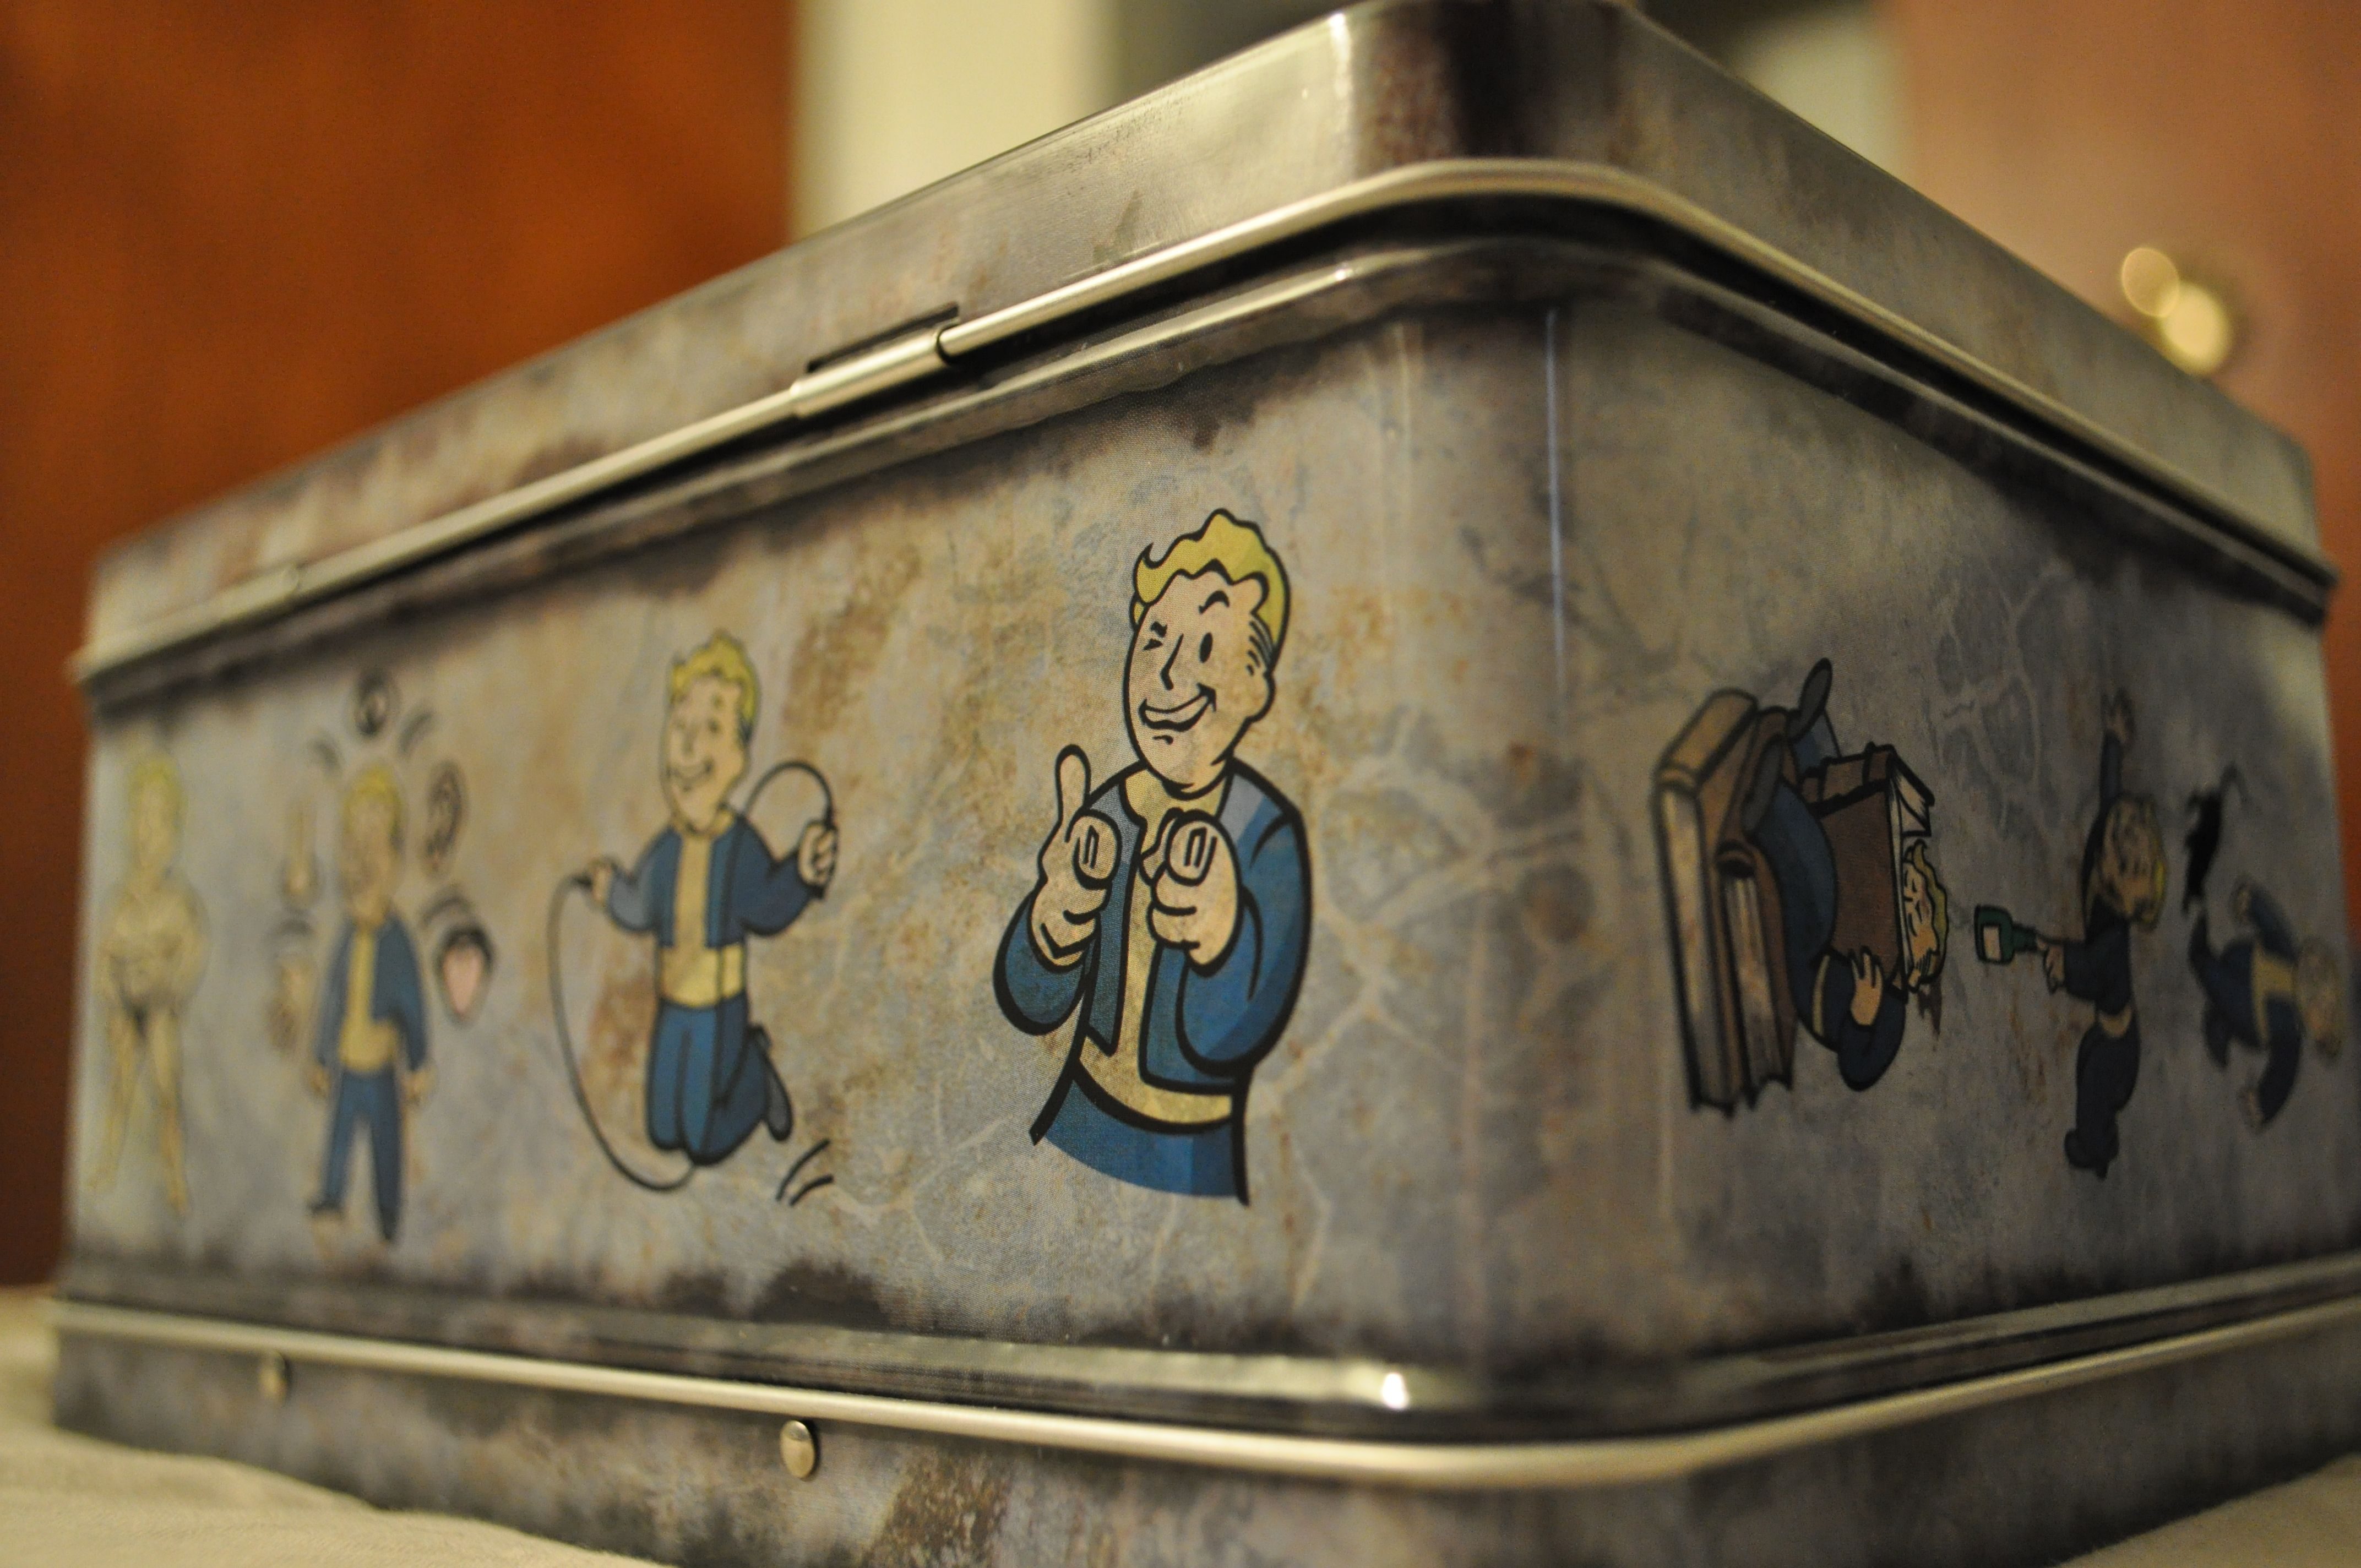 Fallout 4 Hd Wallpapers Fallout Wallpaper Hd Wallpaper Desktop